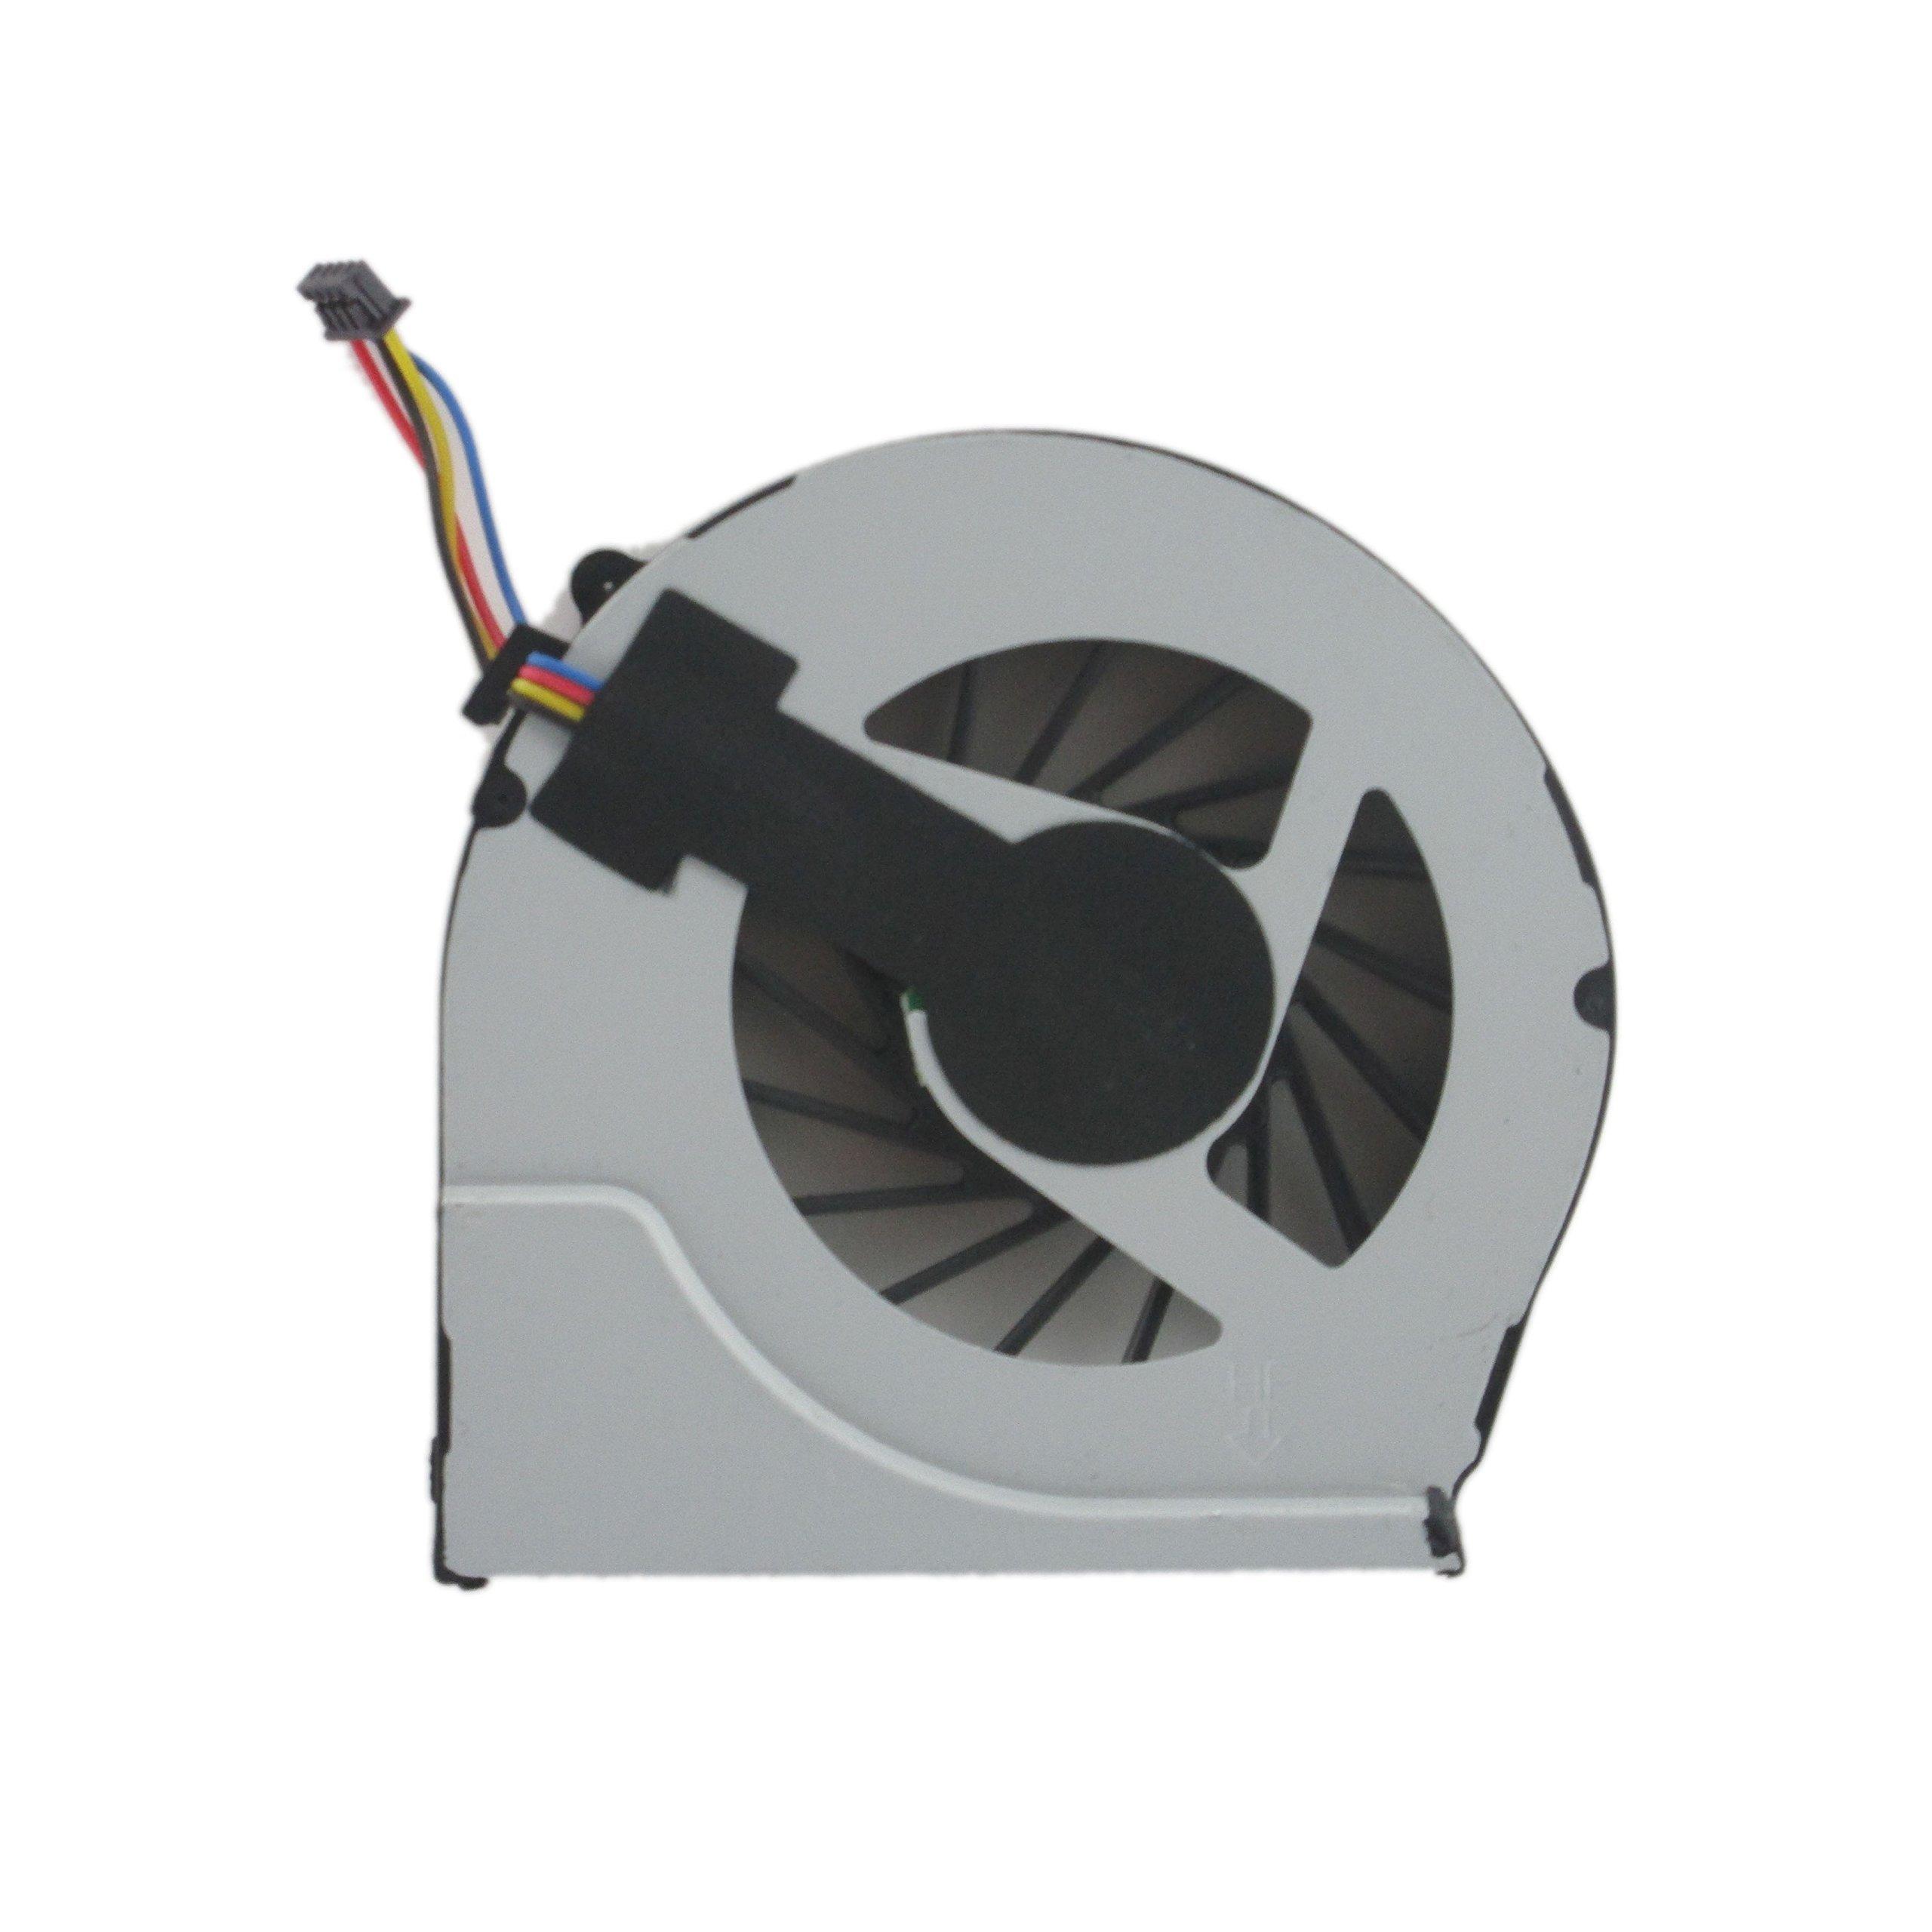 Cooler para HP Pavilion G4-2000 G7-2000 G6-2000 Series - 4 Pin  4 Connector